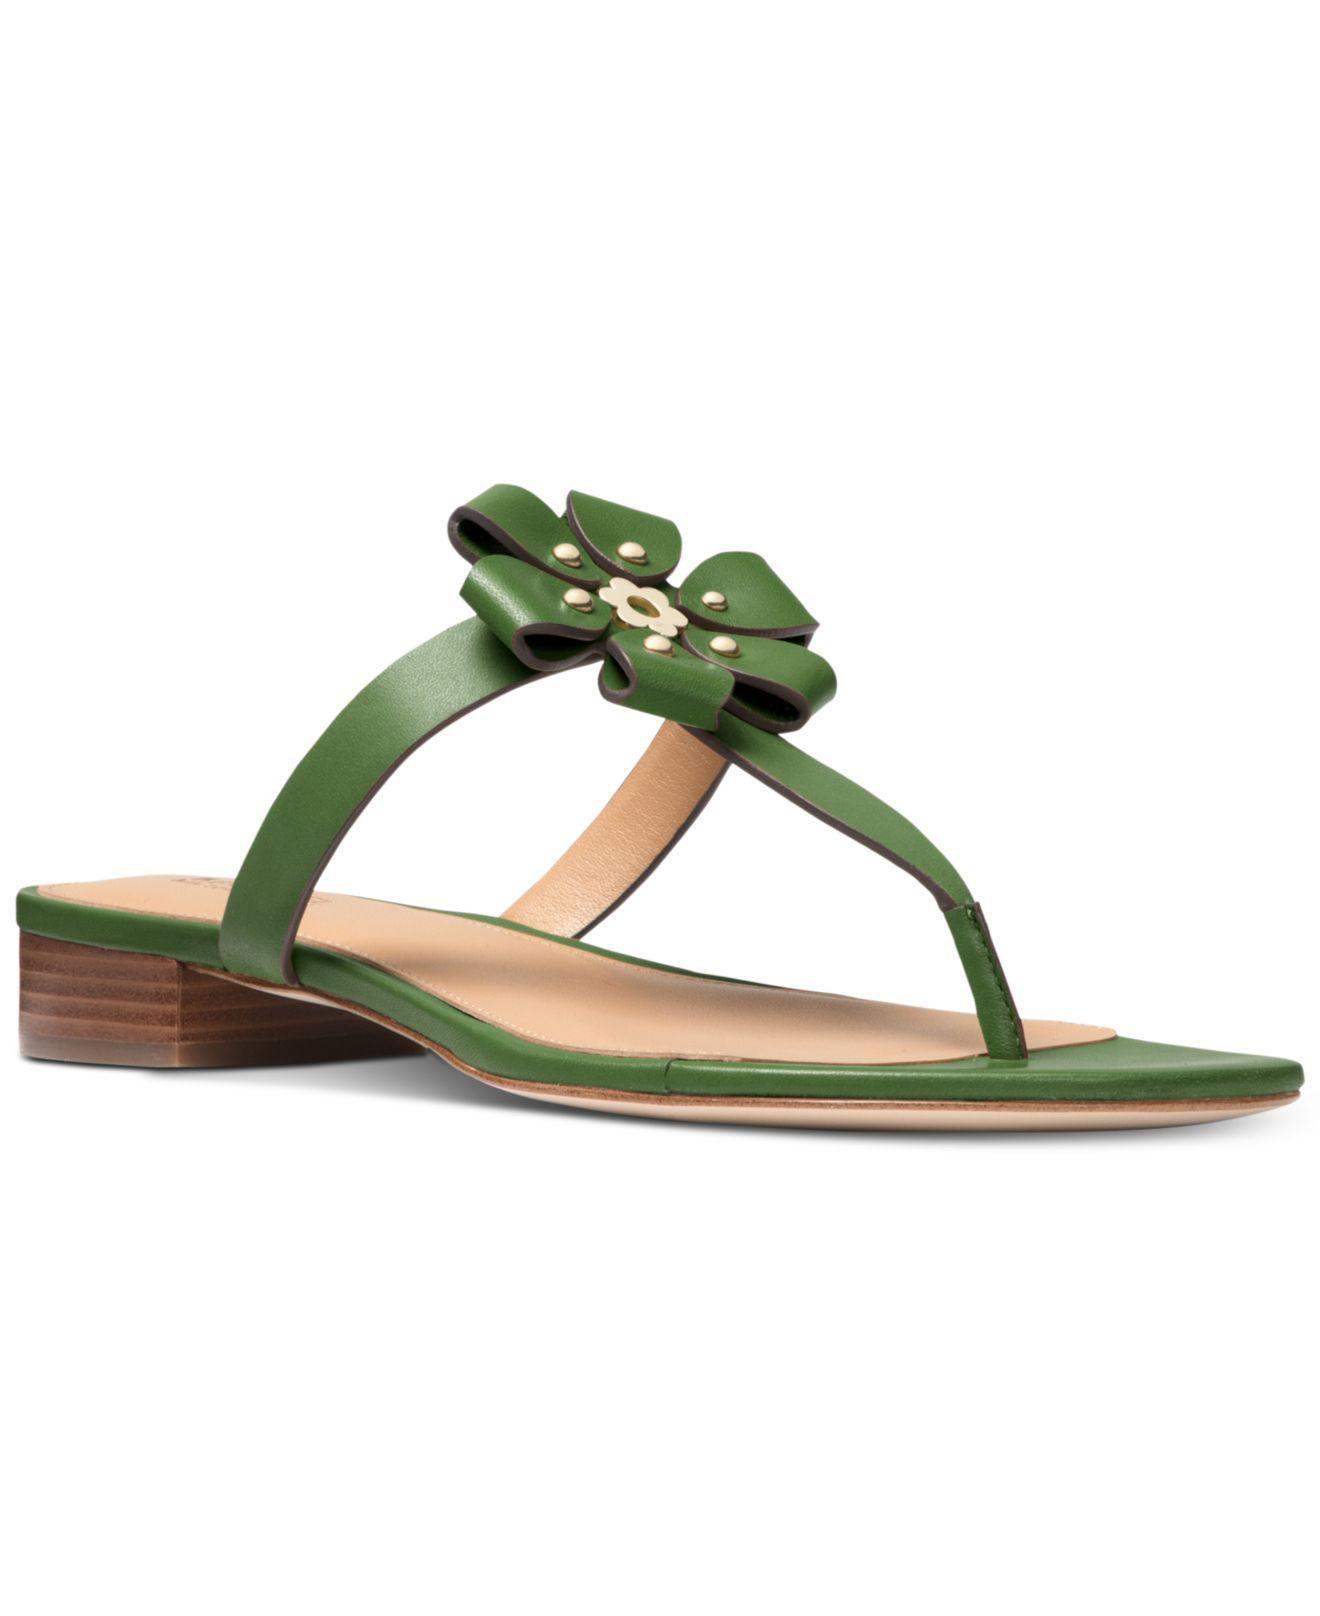 646f7caecc9 Michael Kors Tara Flat Thong Sandals in Green - Lyst